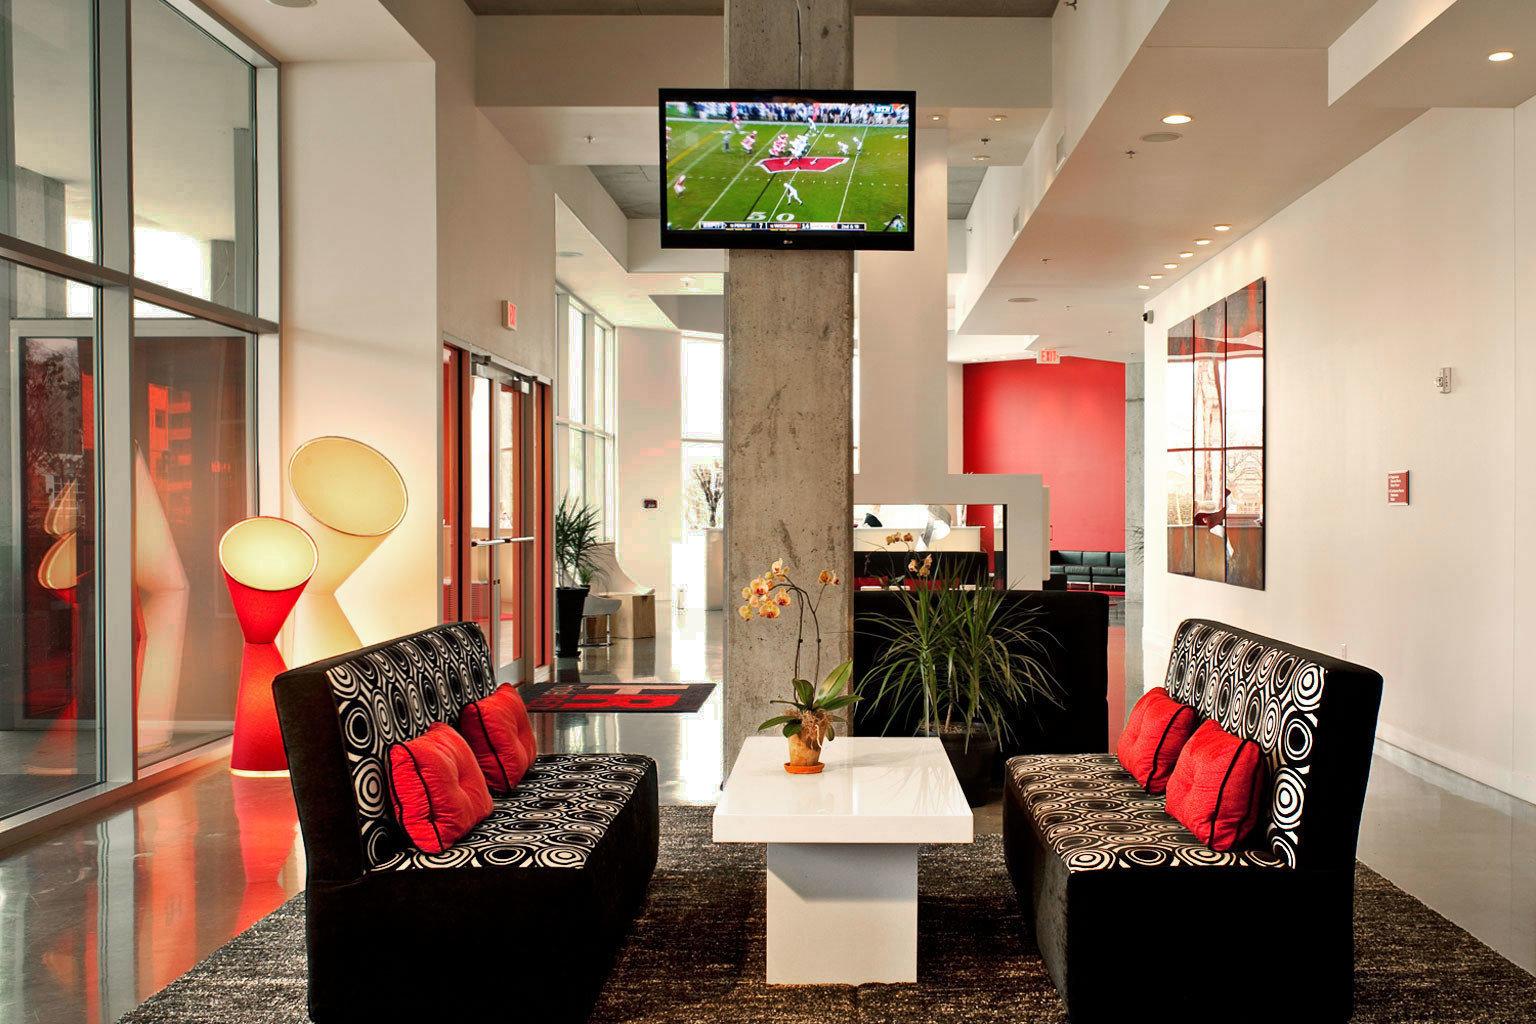 Entertainment Resort property Lobby living room red home condominium rug